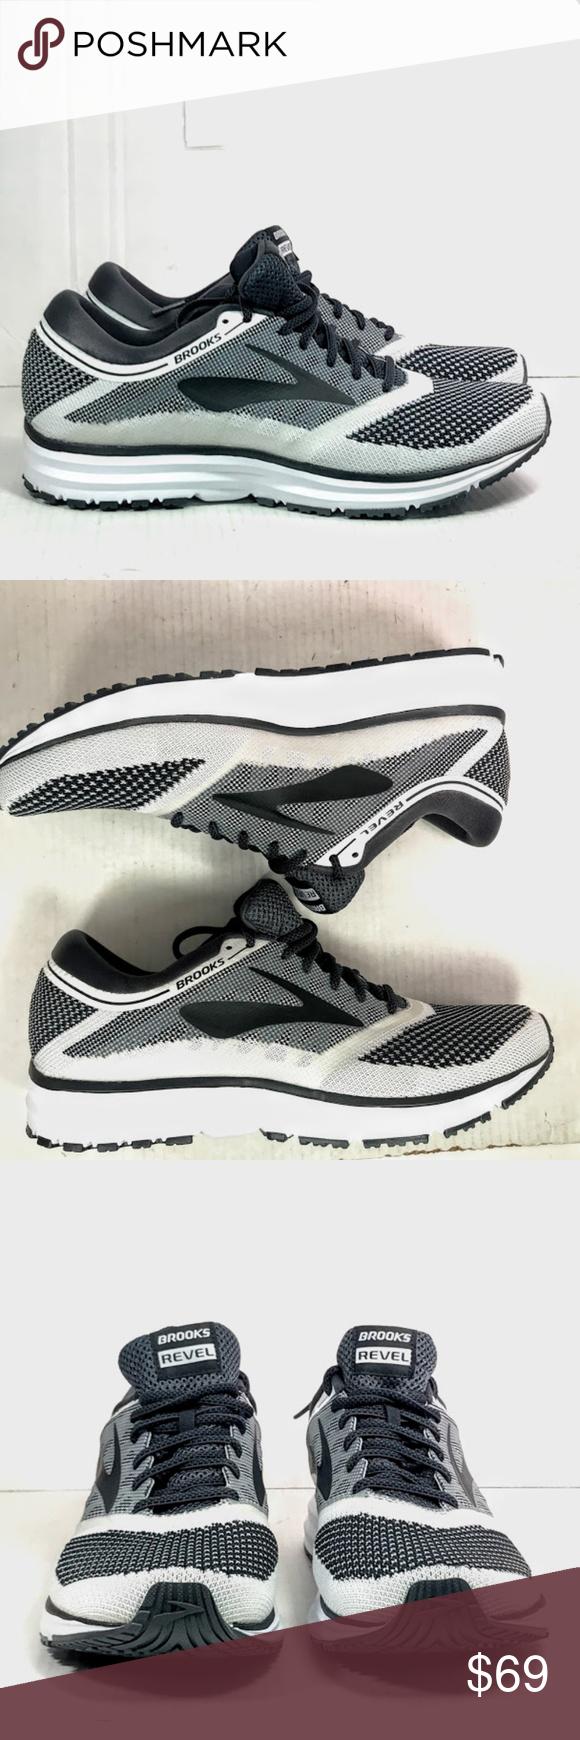 4c8f1ab6c9a Brooks Revel White Anthracite Black Running shoes Brooks Mens Revel White  Anthracite Black Running Shoes Size